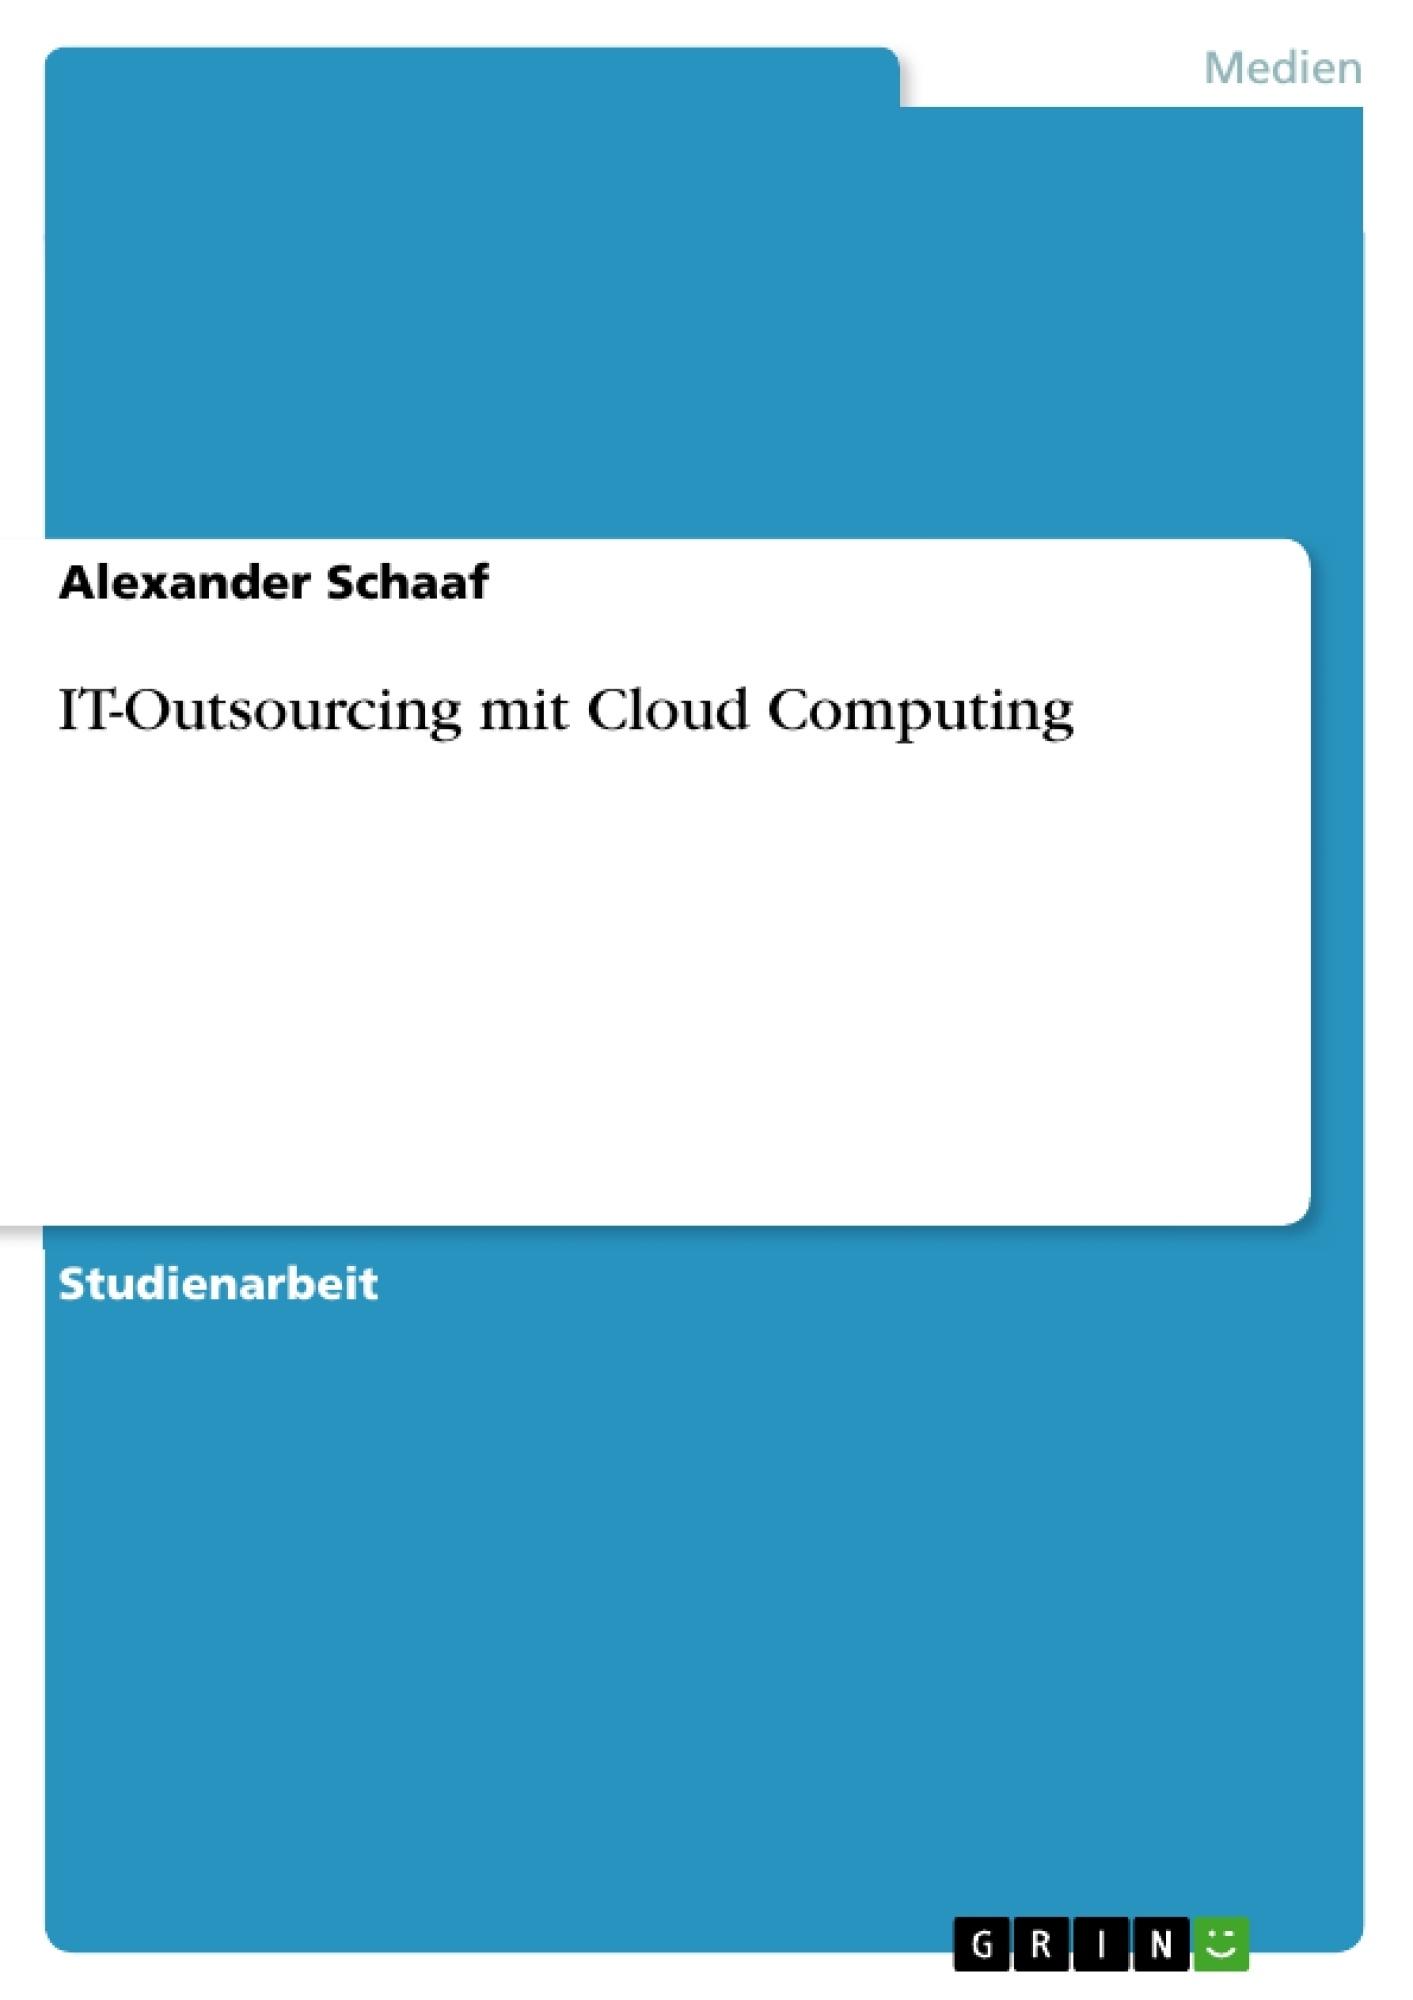 Titel: IT-Outsourcing mit Cloud Computing